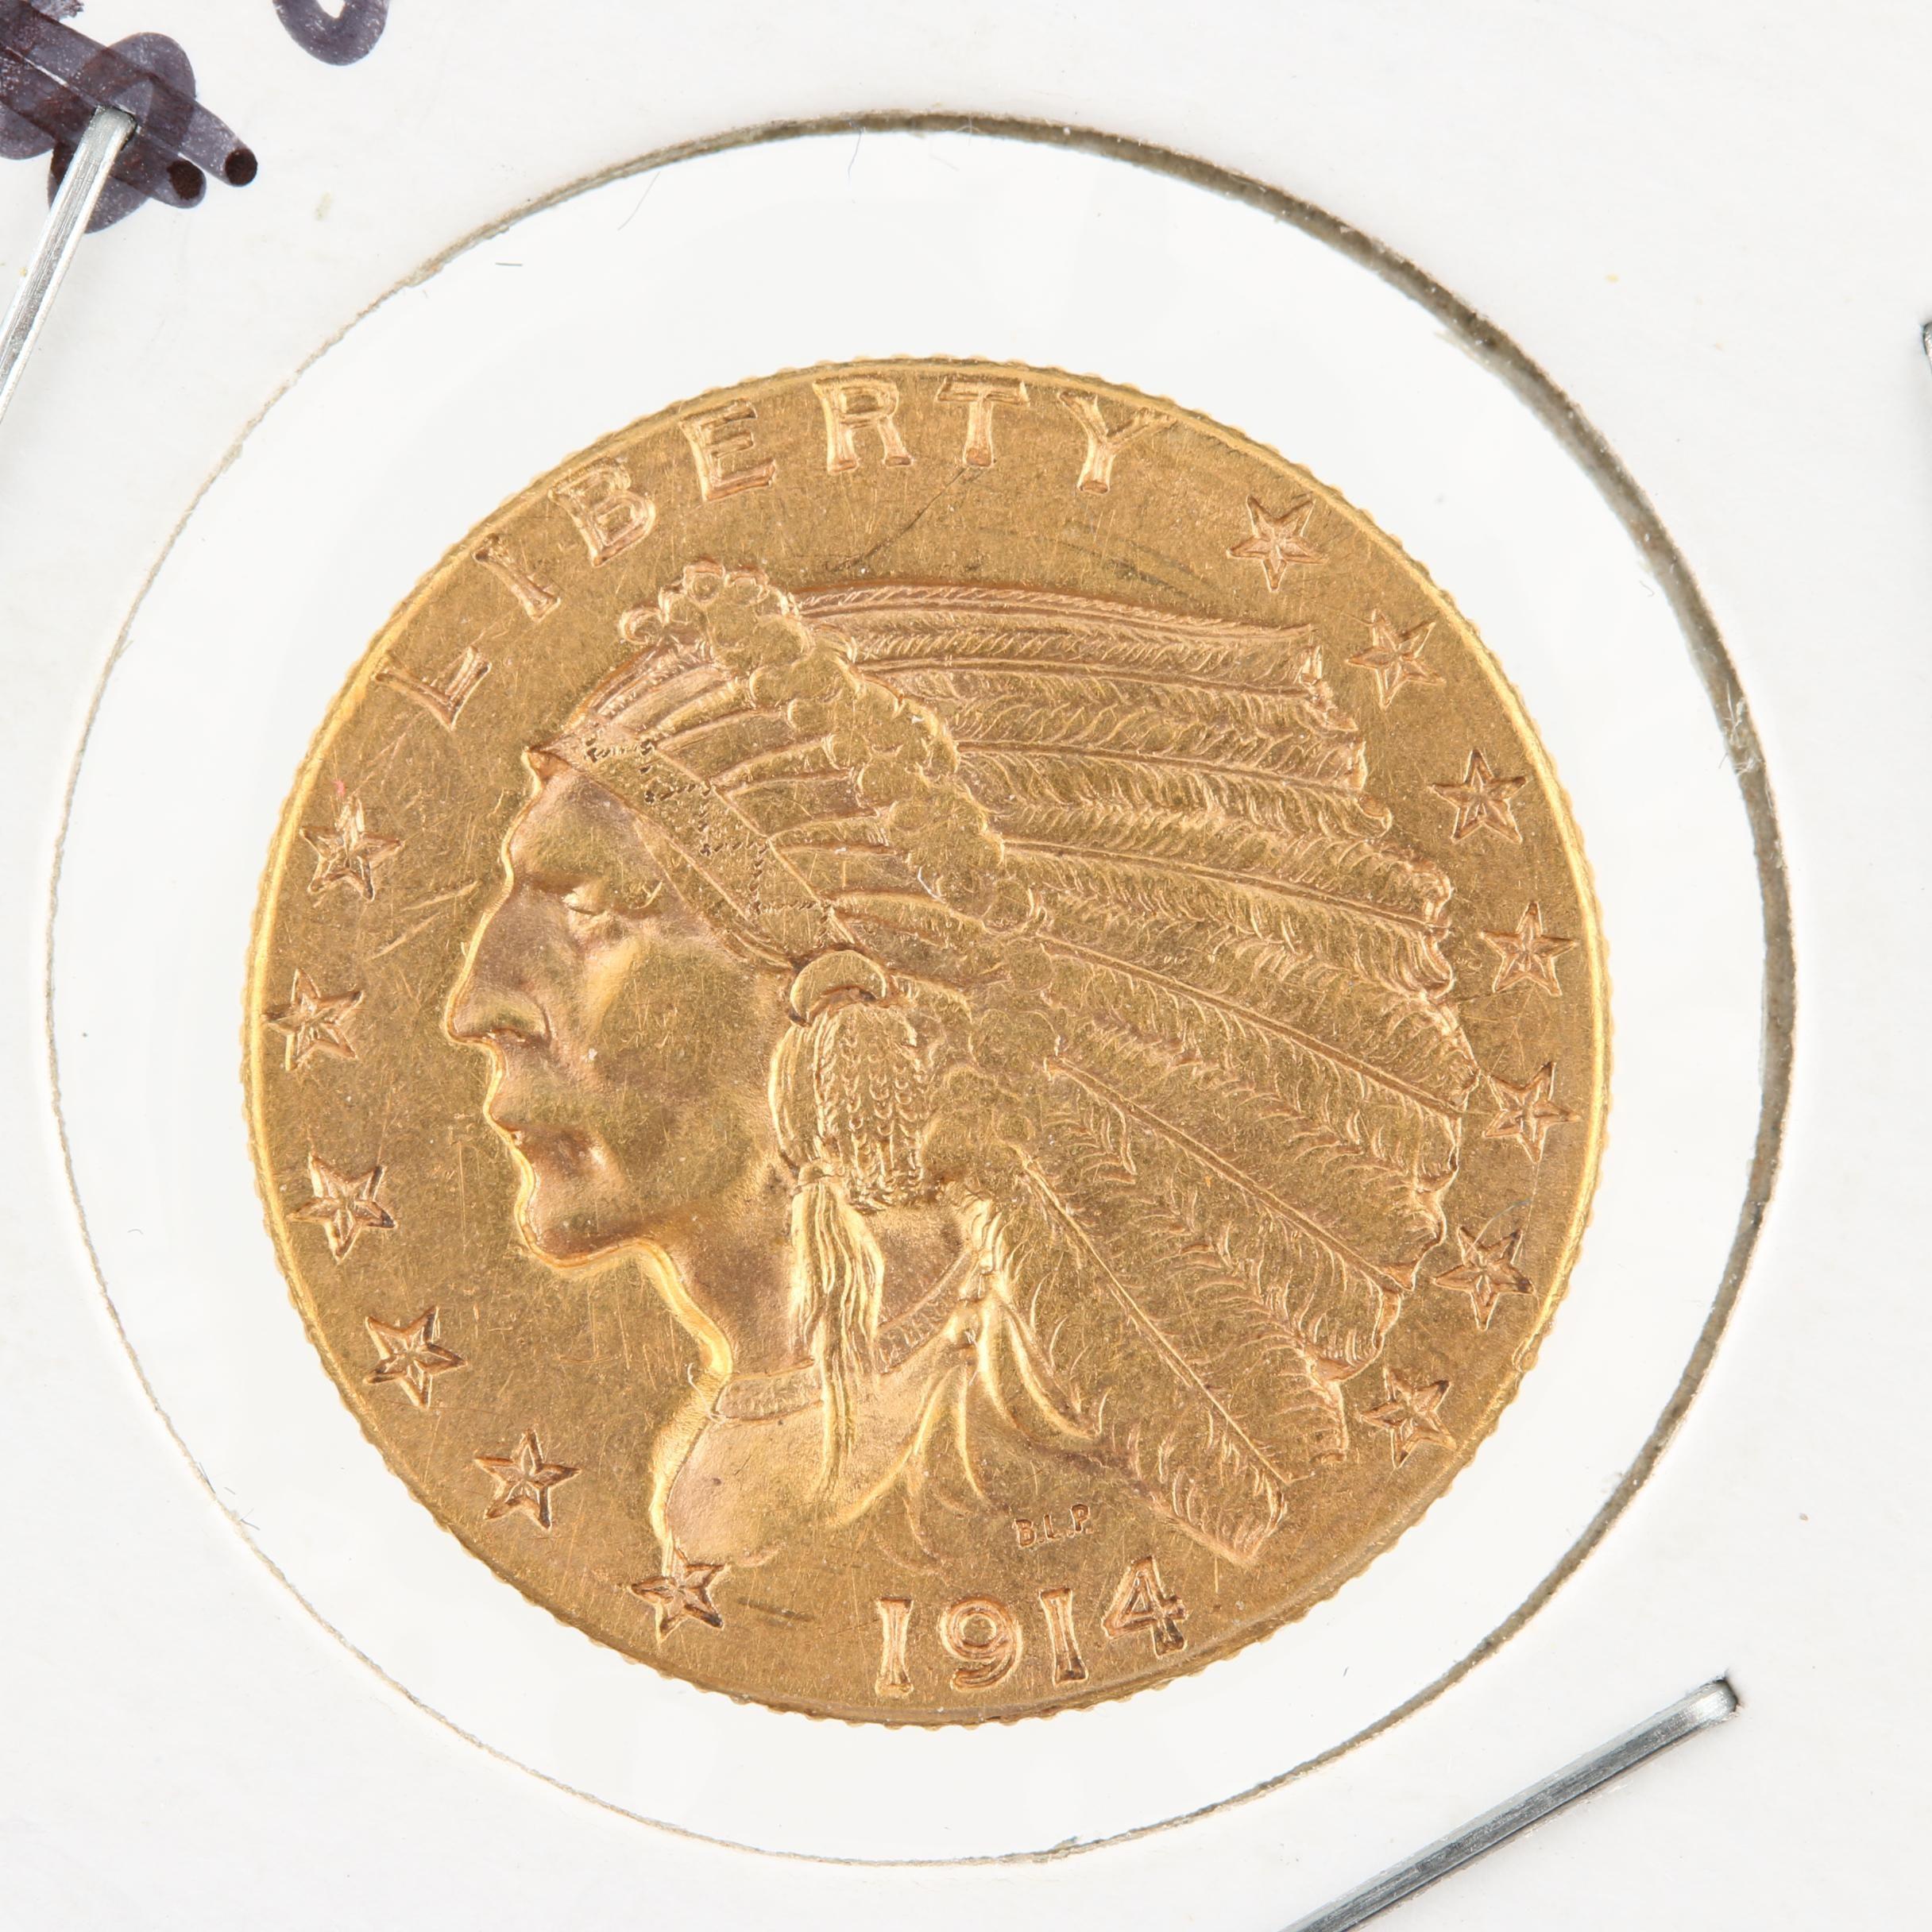 1914-D Liberty Head $2 1/2 Gold Coin